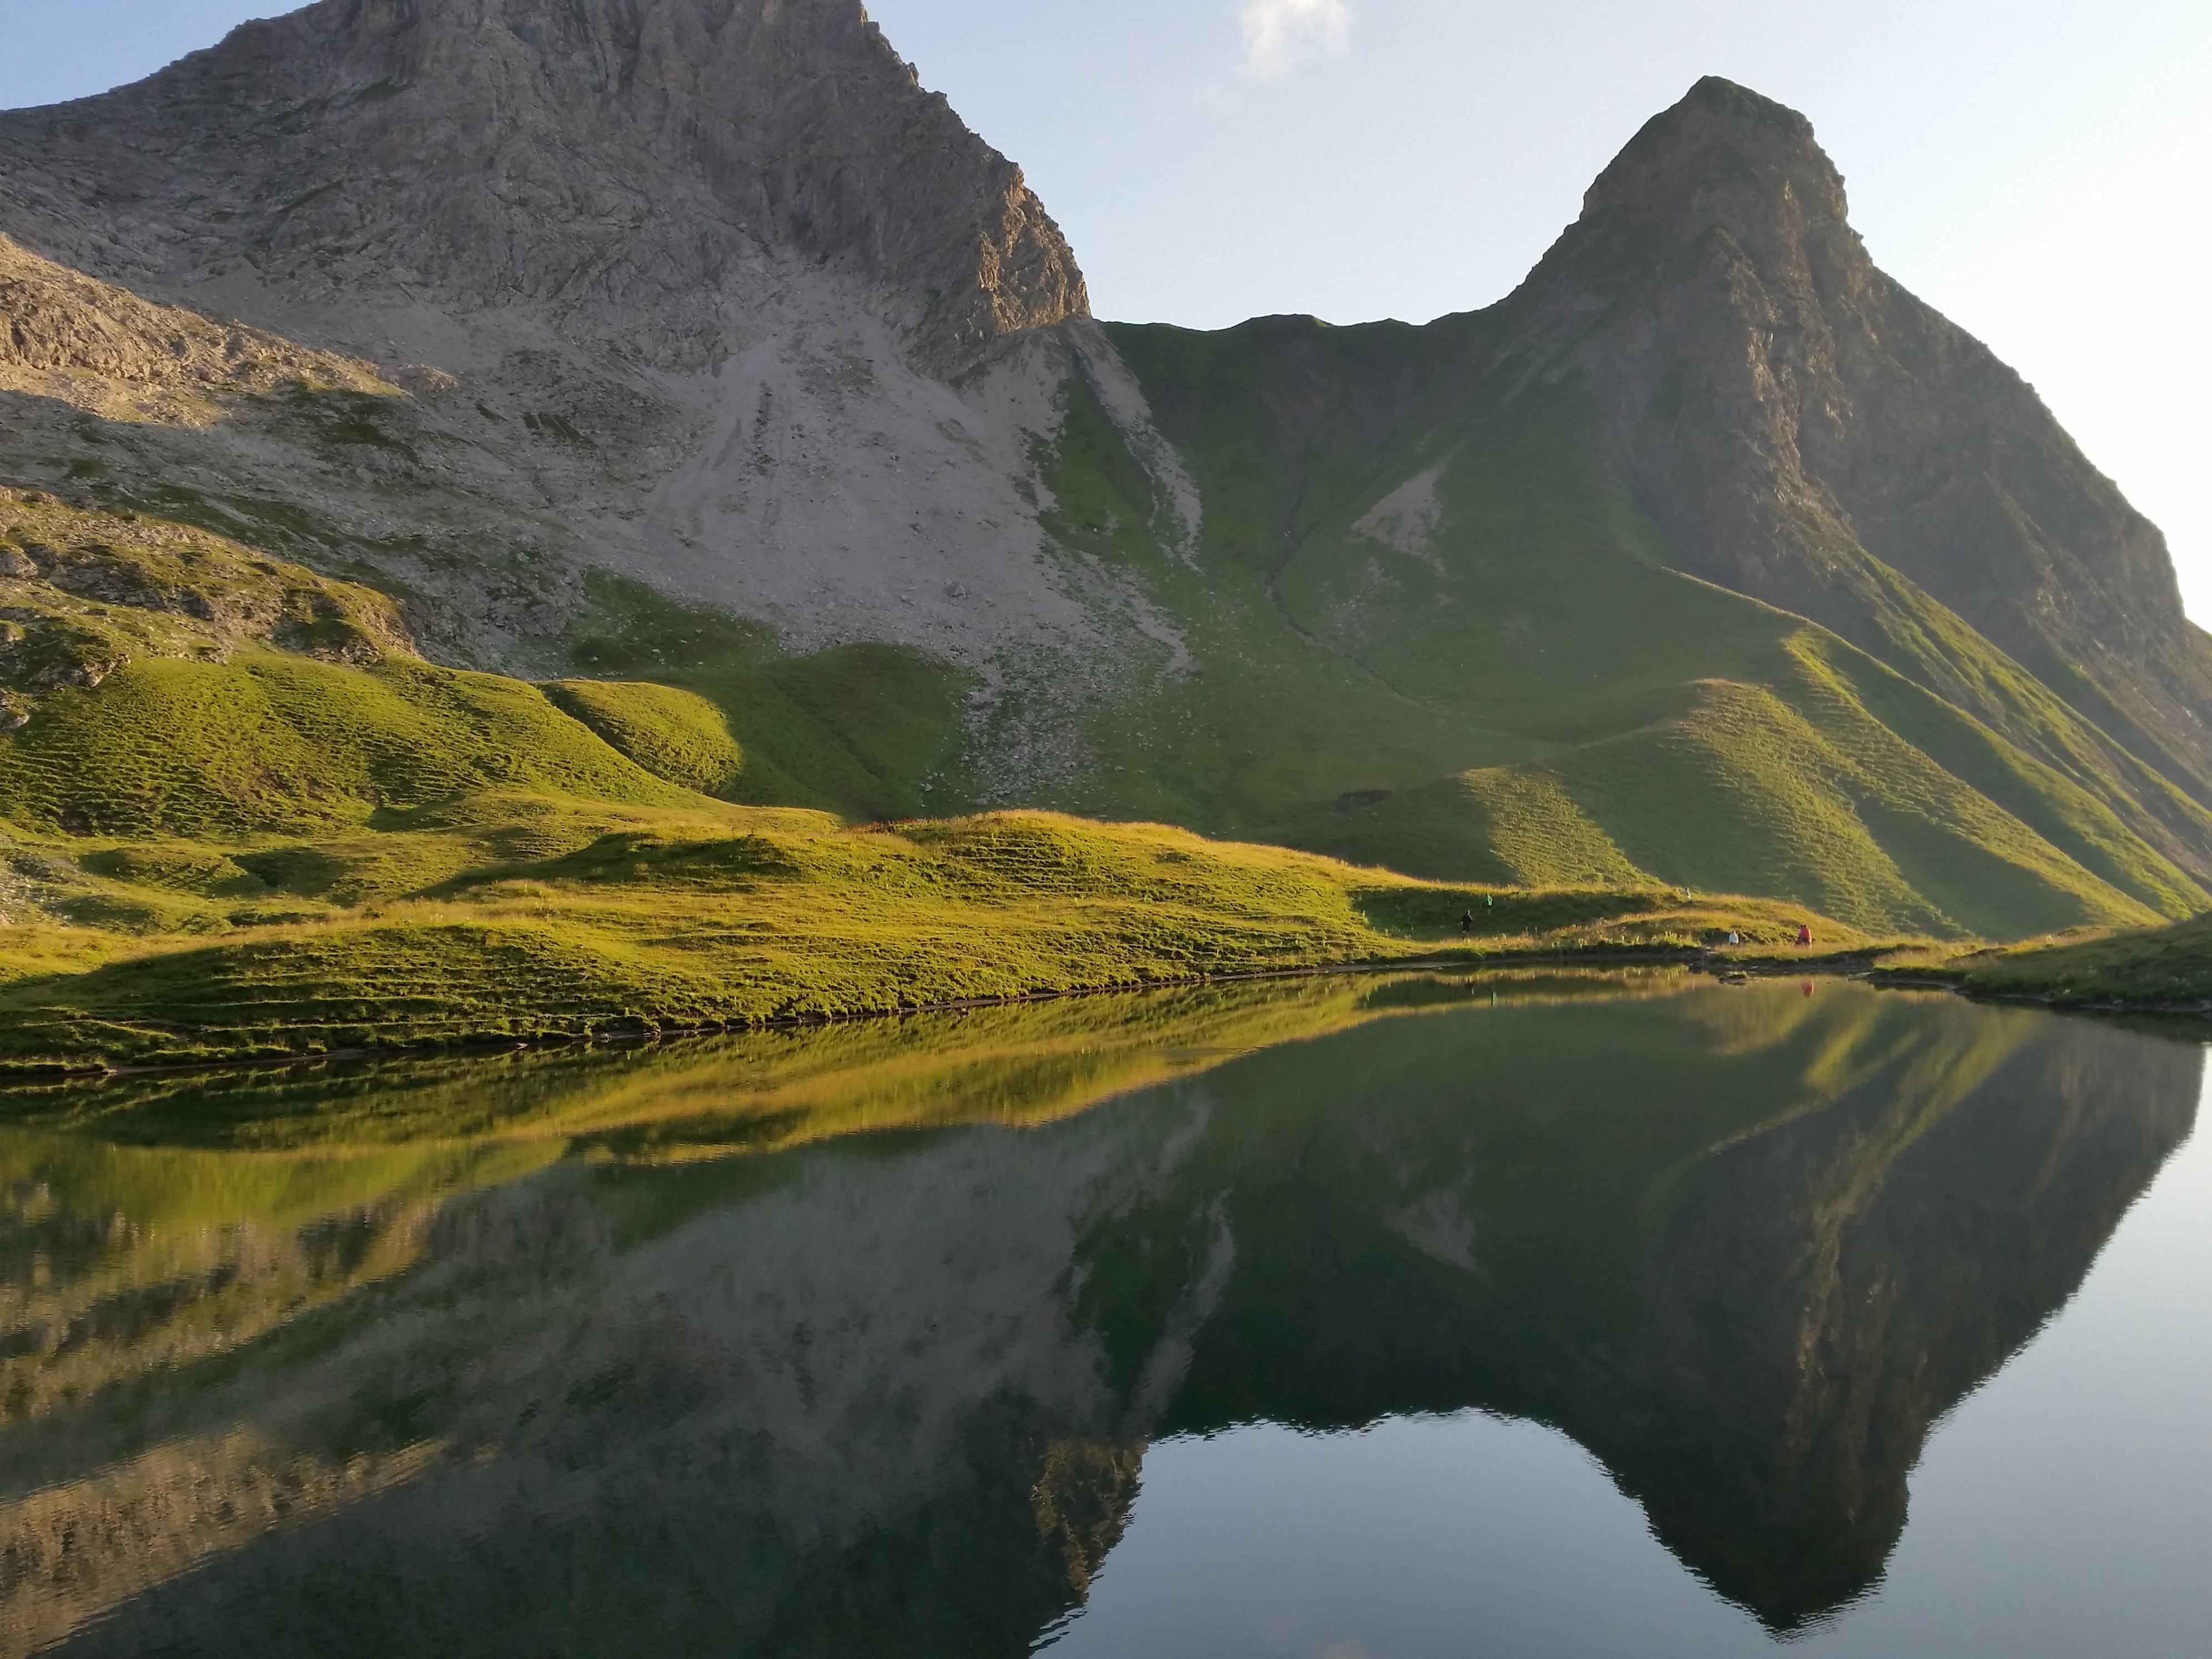 green mountain near lake under white cloudy sky